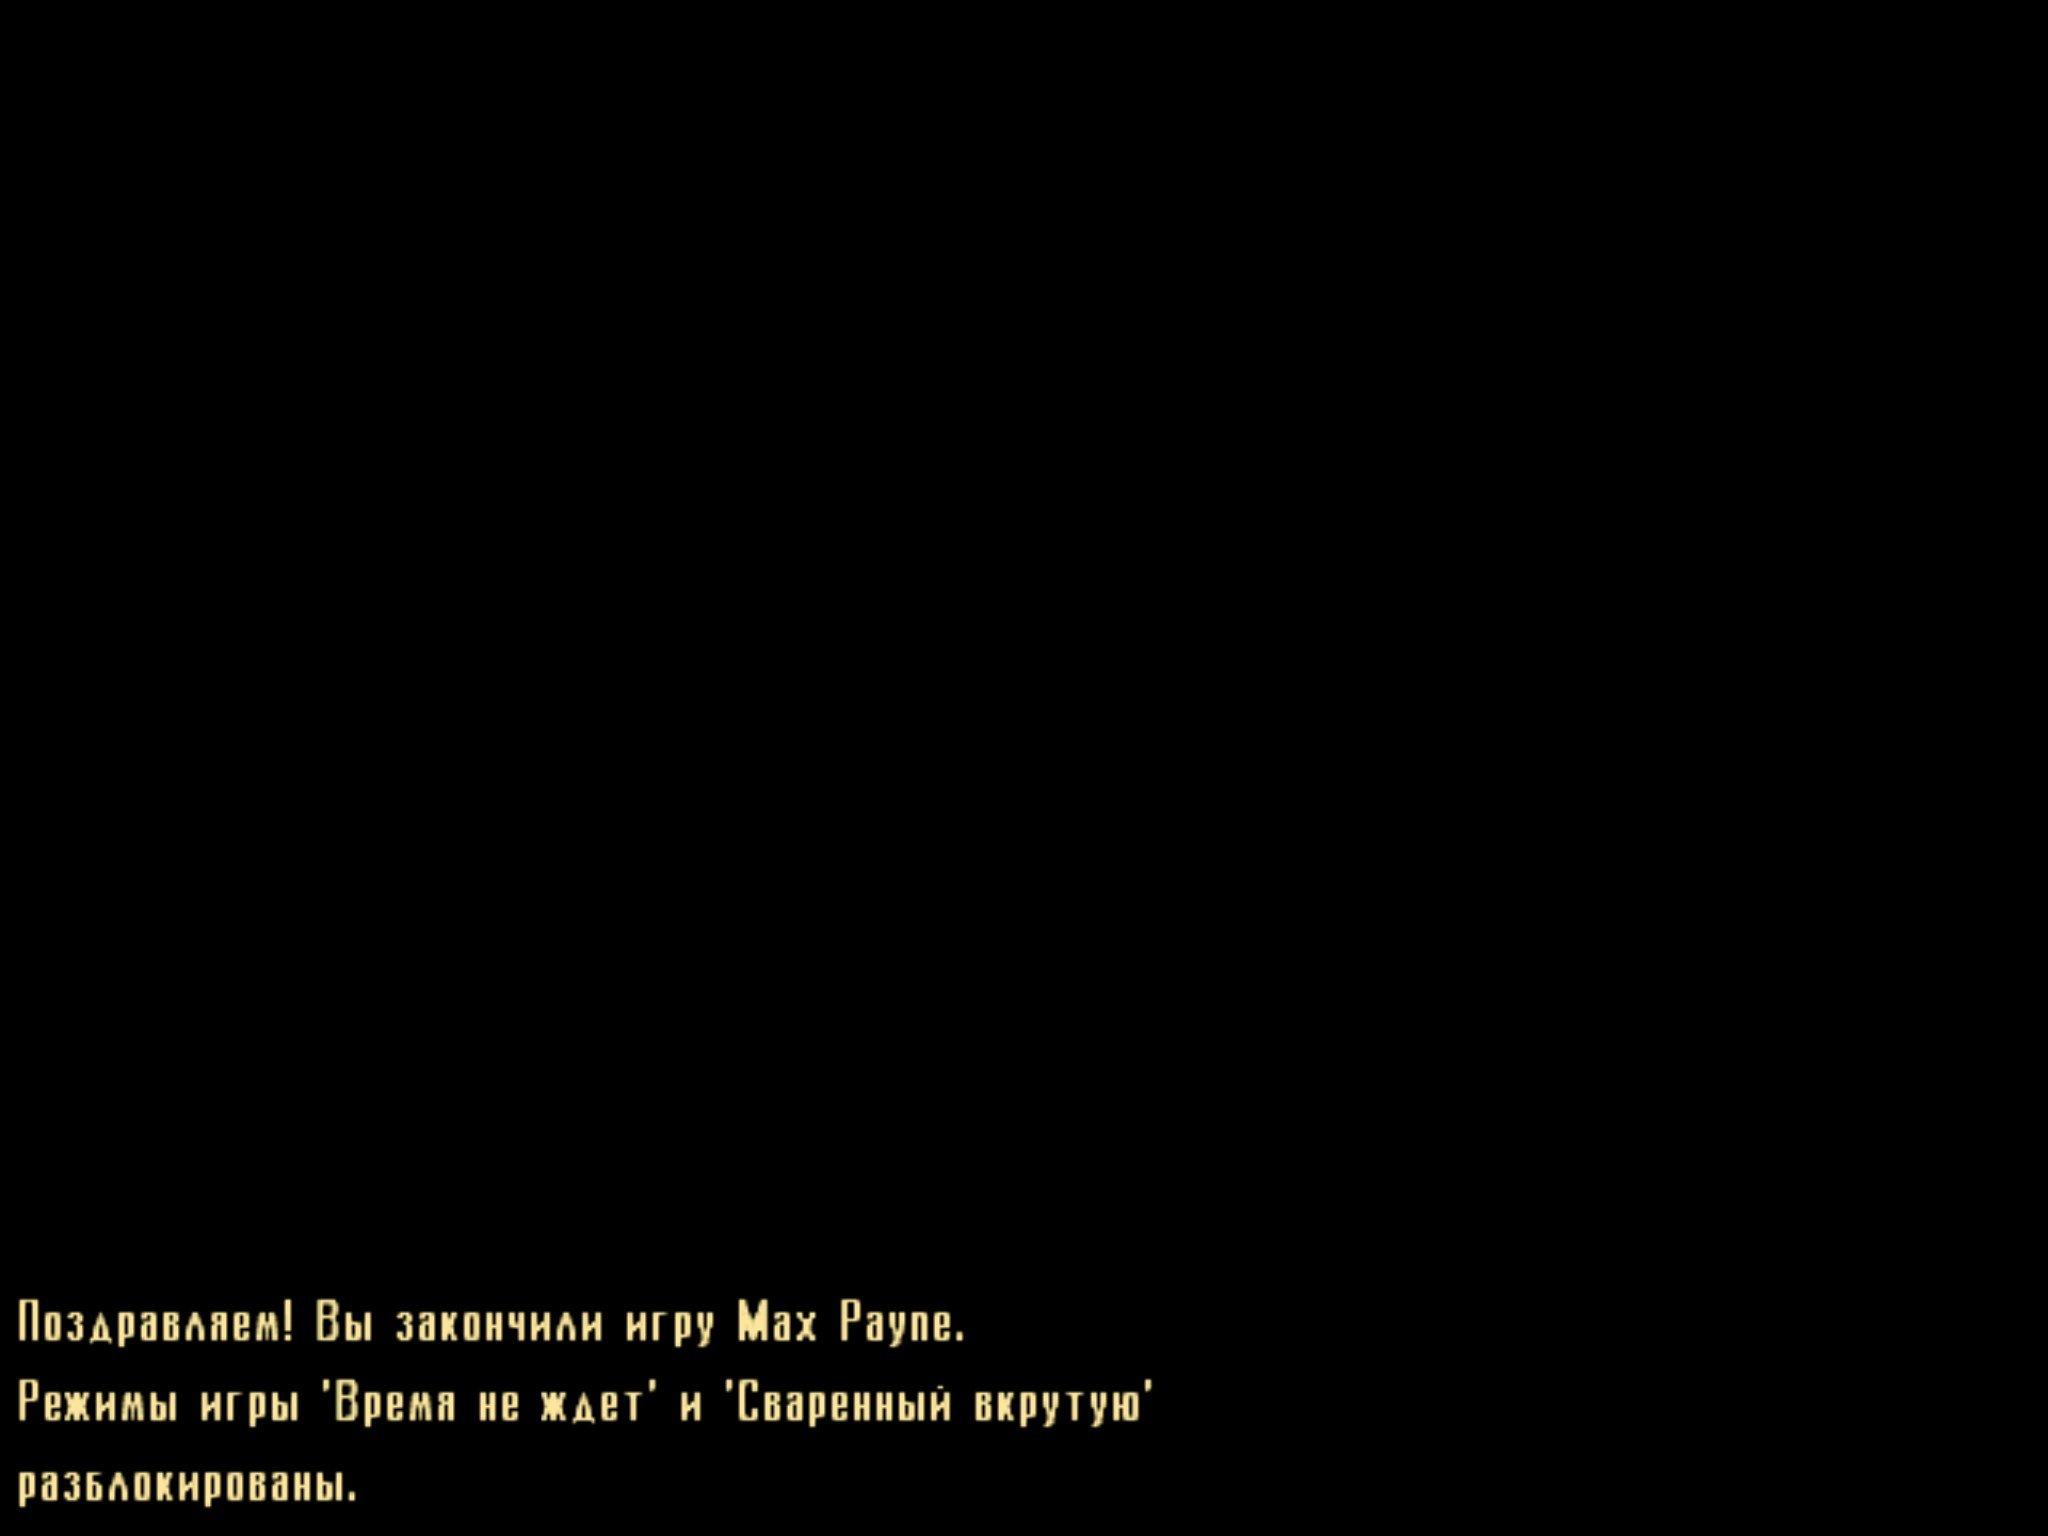 Наконец прошел Max Payne Mobile. - Изображение 3